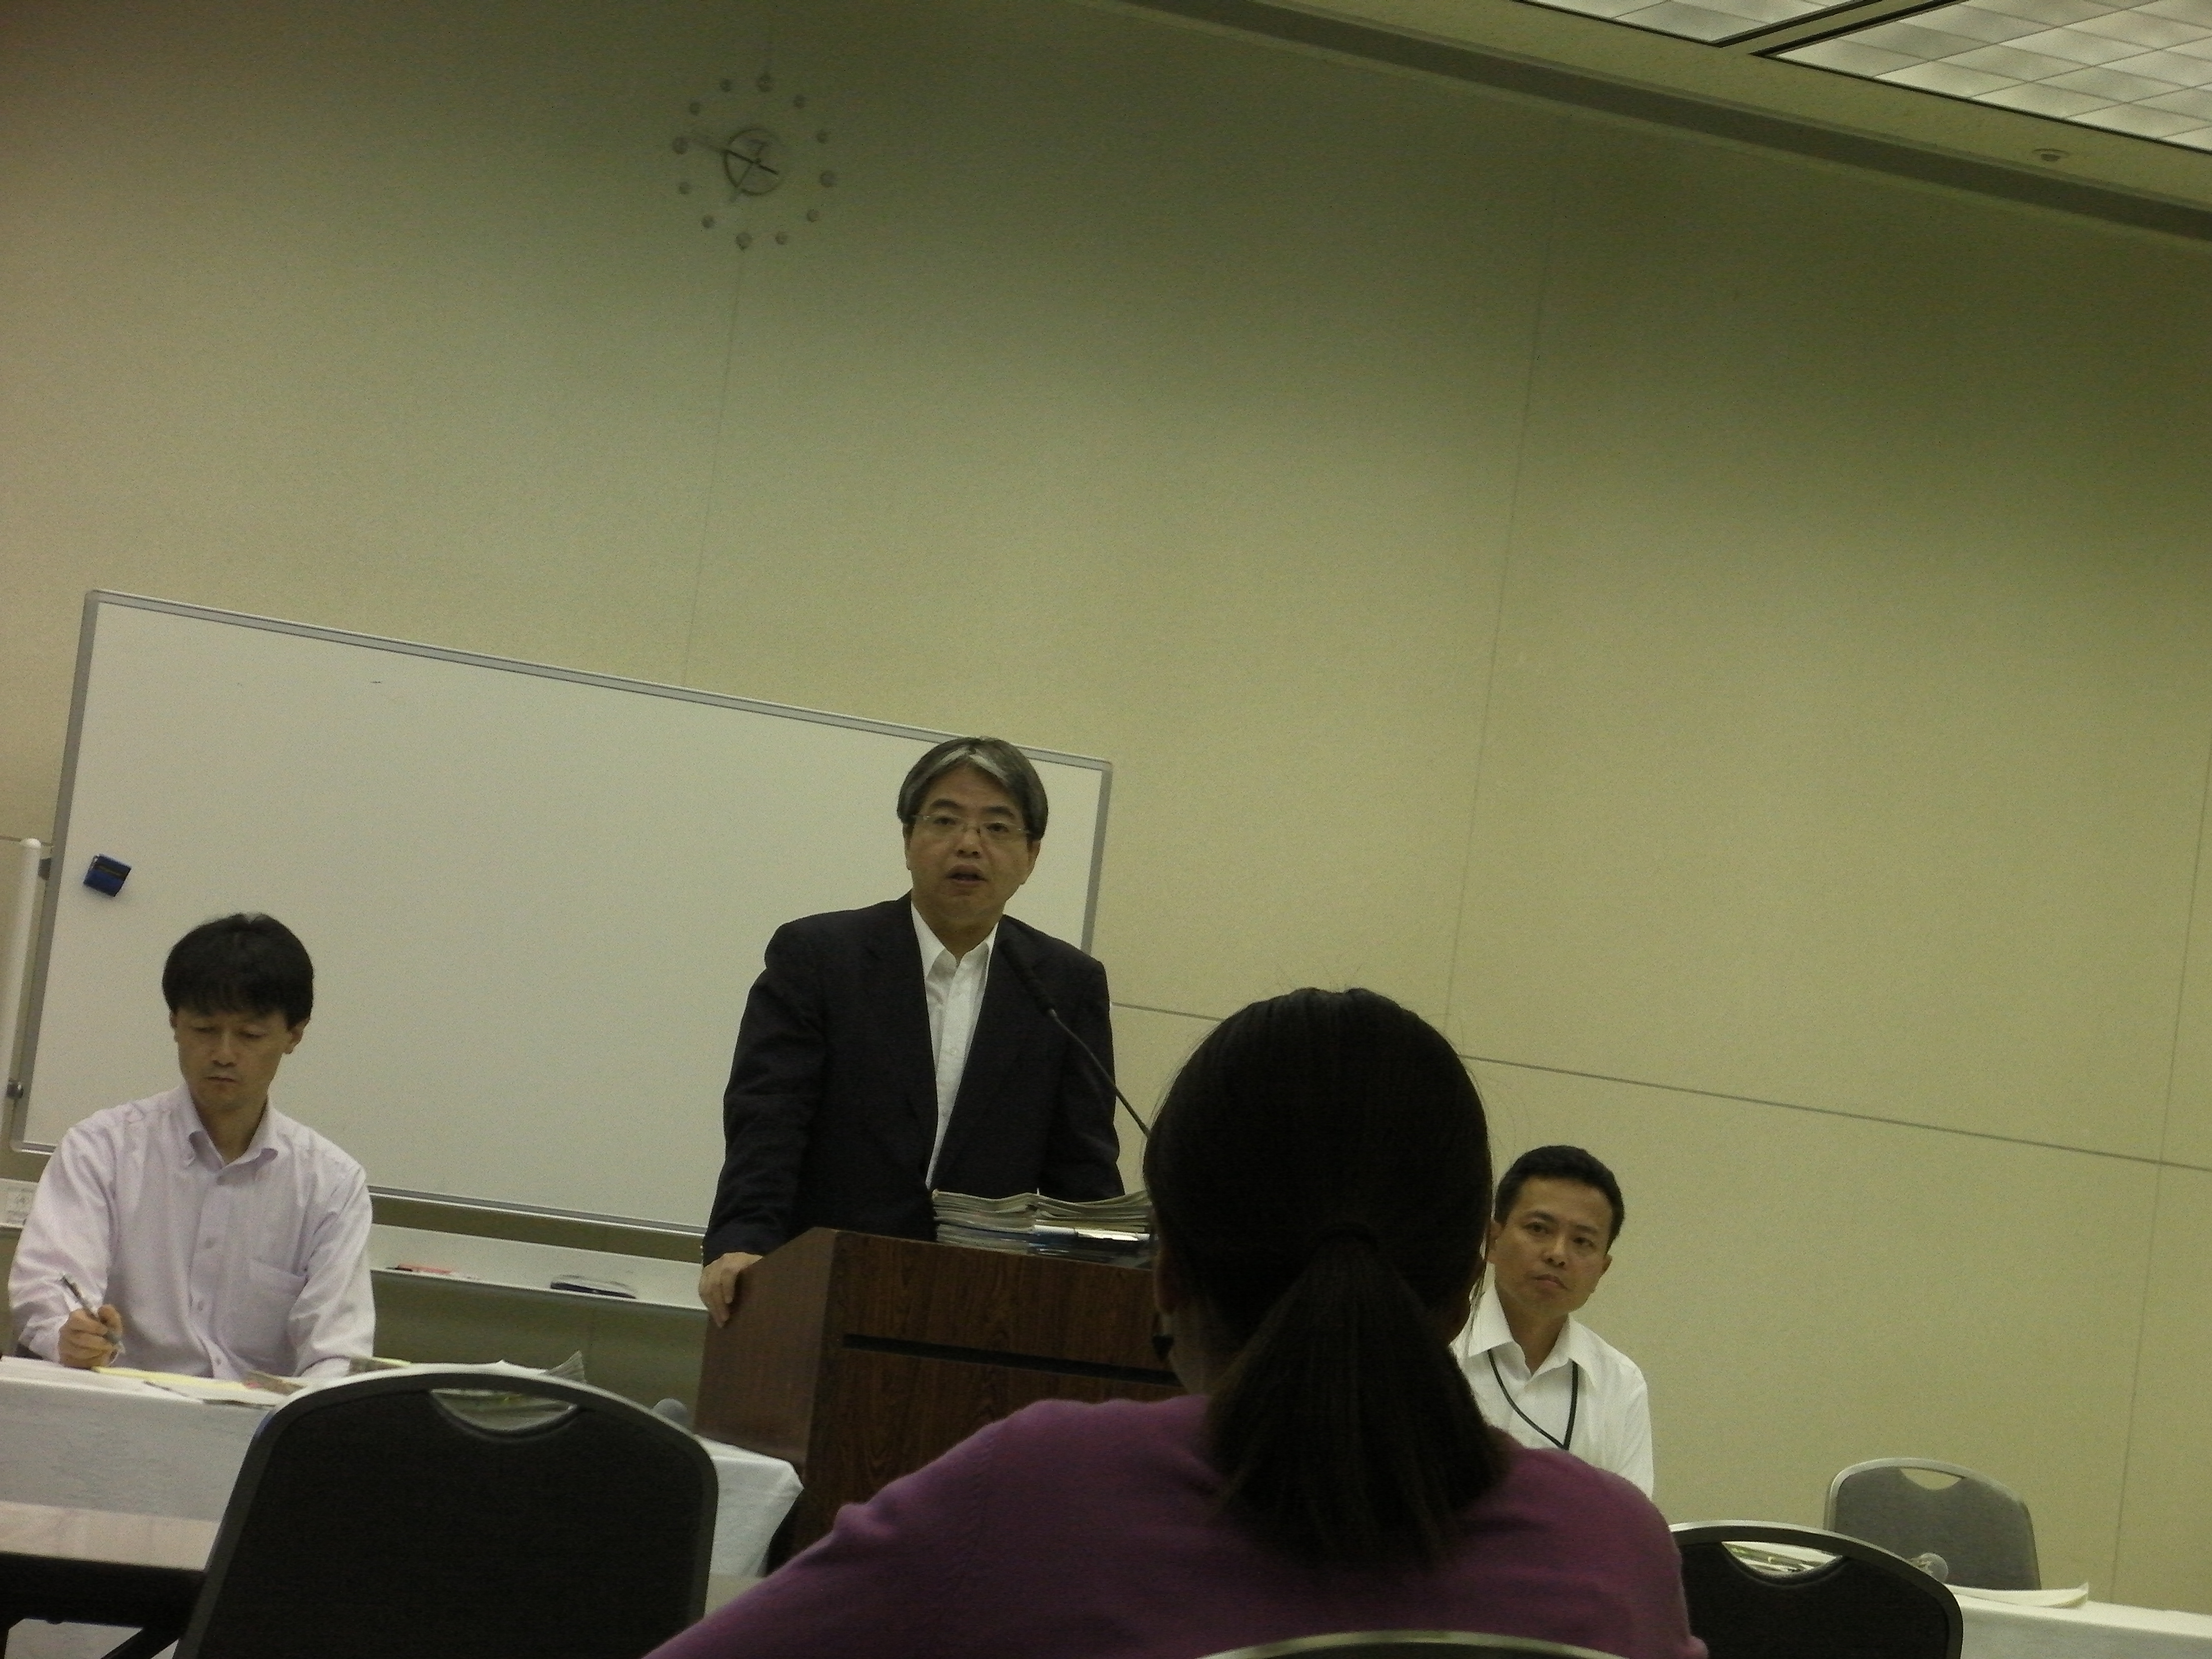 http://daily.magazine9.jp/m9/oshidori/SANY0695.JPG